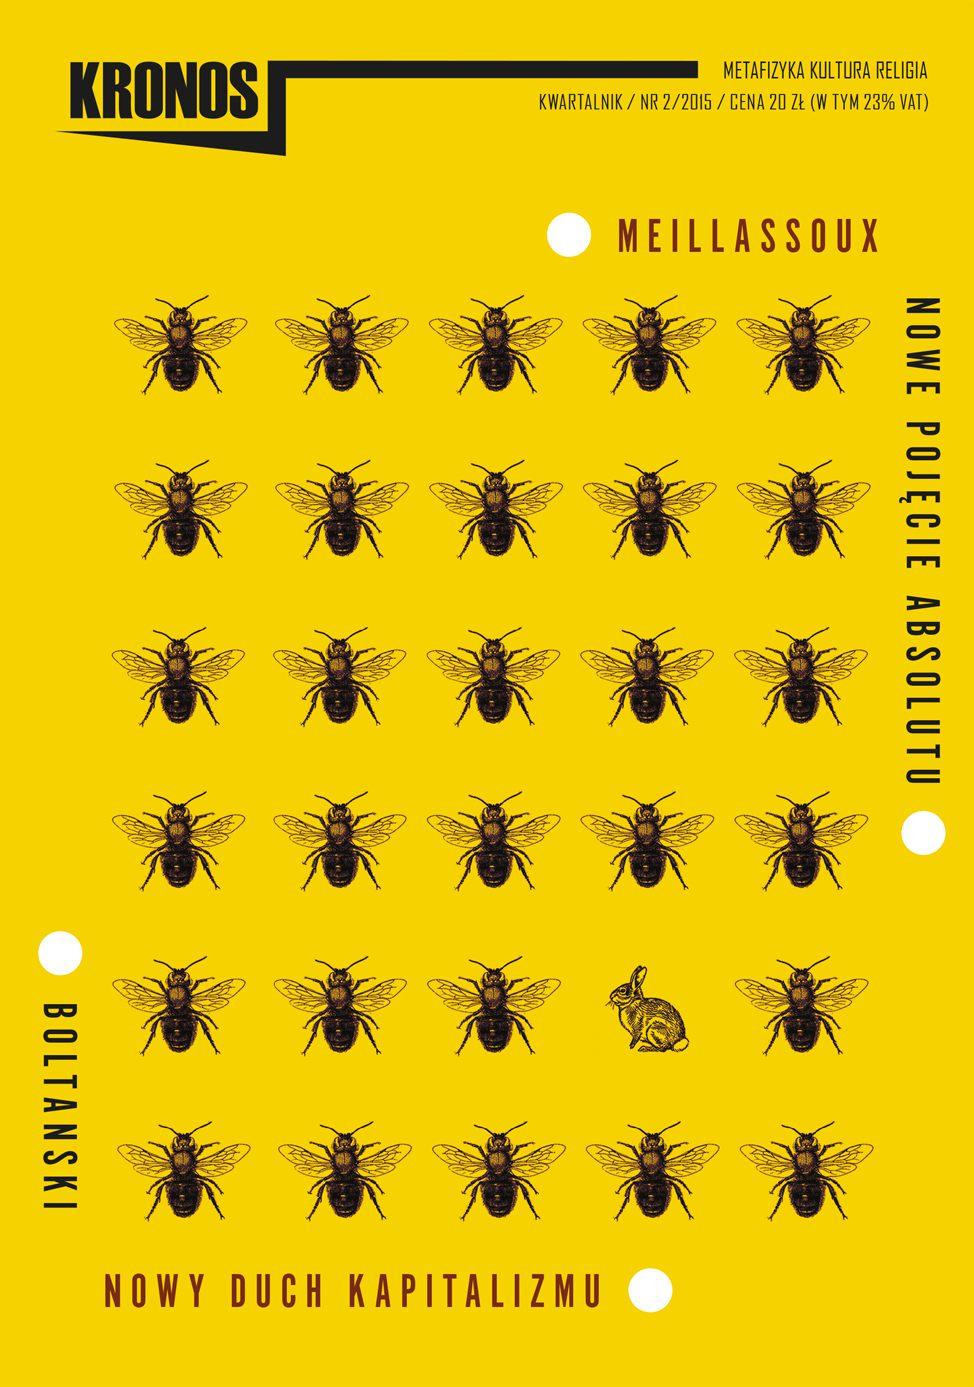 Kronos 2/2015. Boltanski, Meillassoux - Ebook (Książka EPUB) do pobrania w formacie EPUB